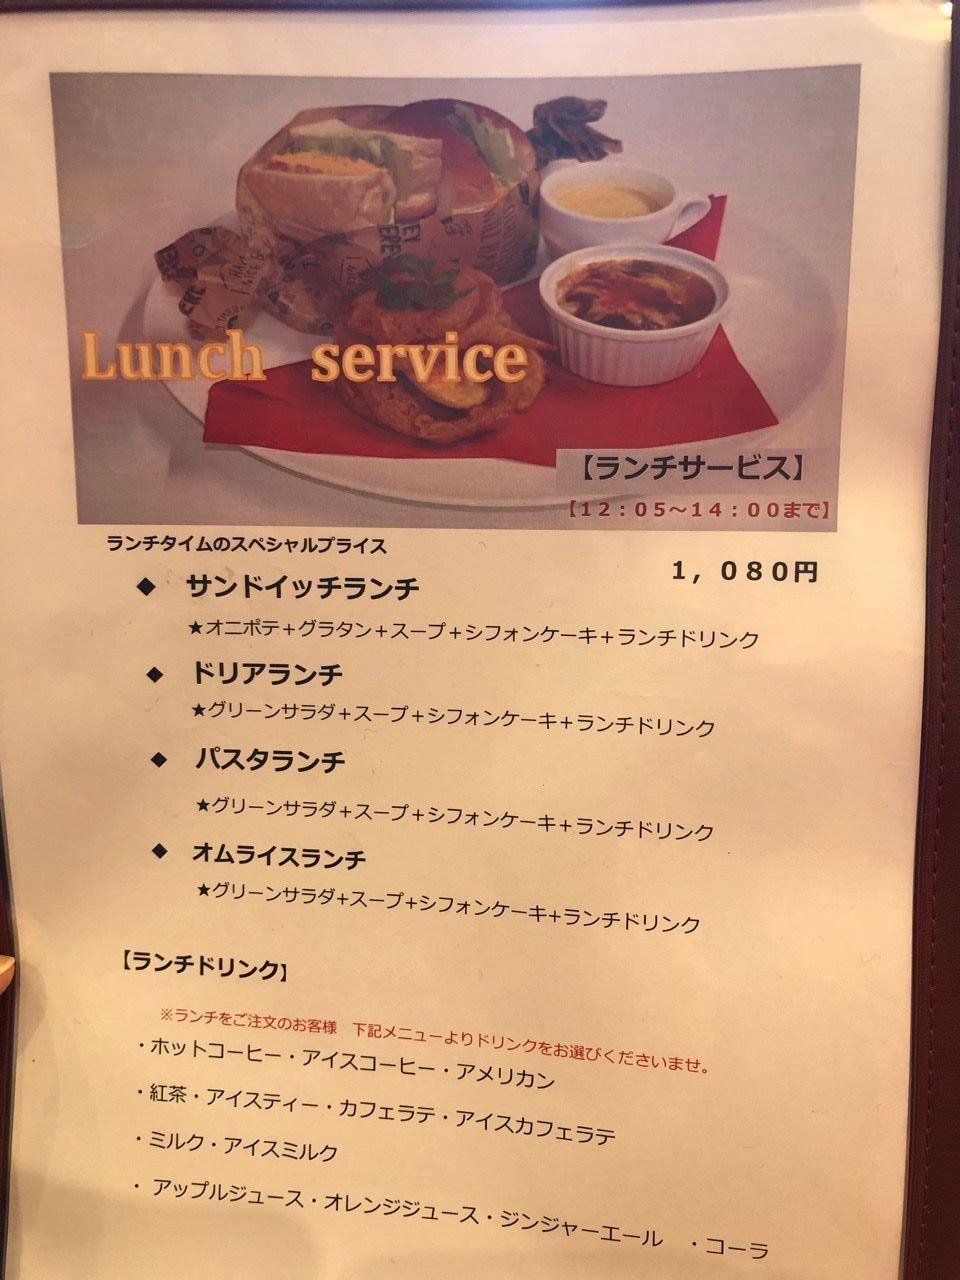 『cafe しょぱん【chopin】KONAN』ランチメニュー